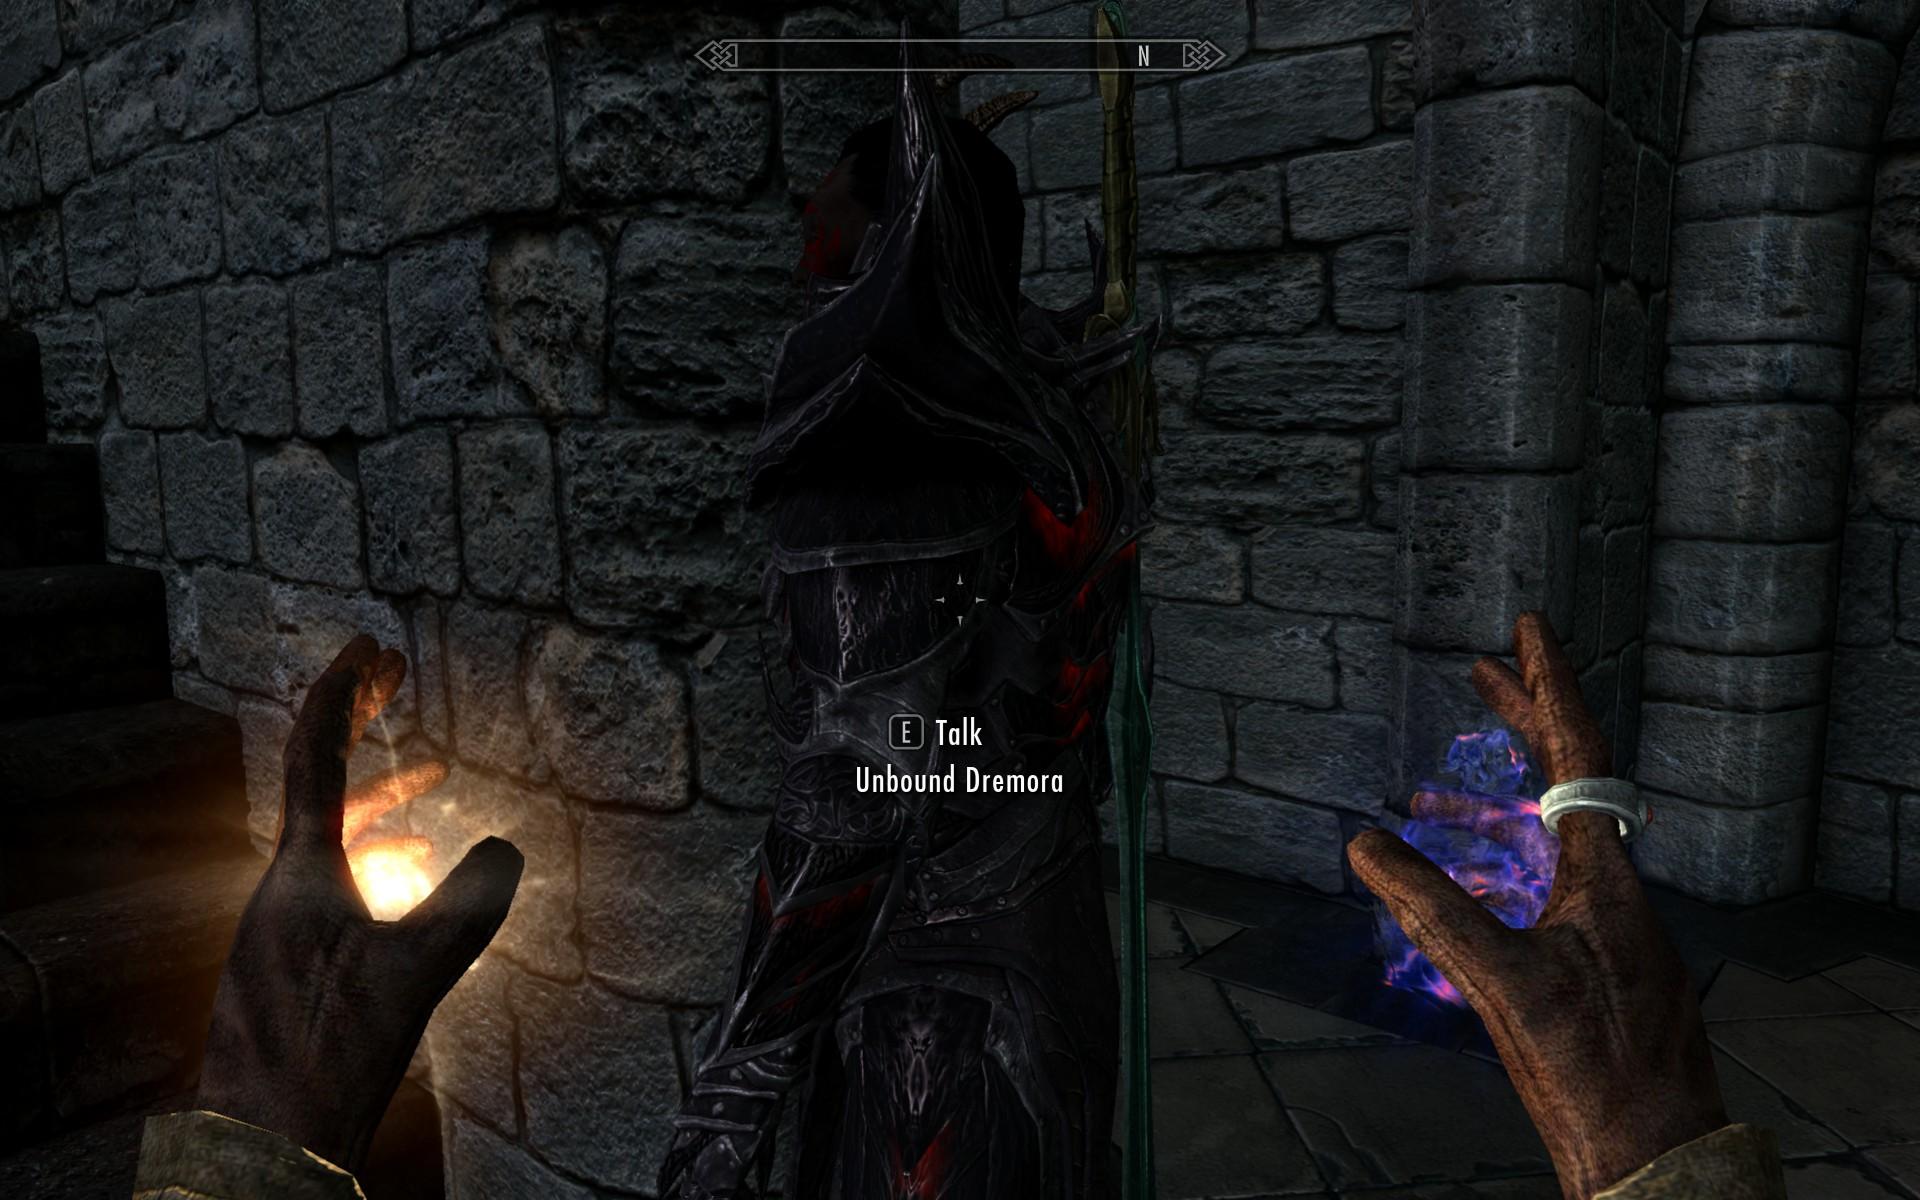 A screenshot from Skyrim shows an unbound dremora just wandering around.